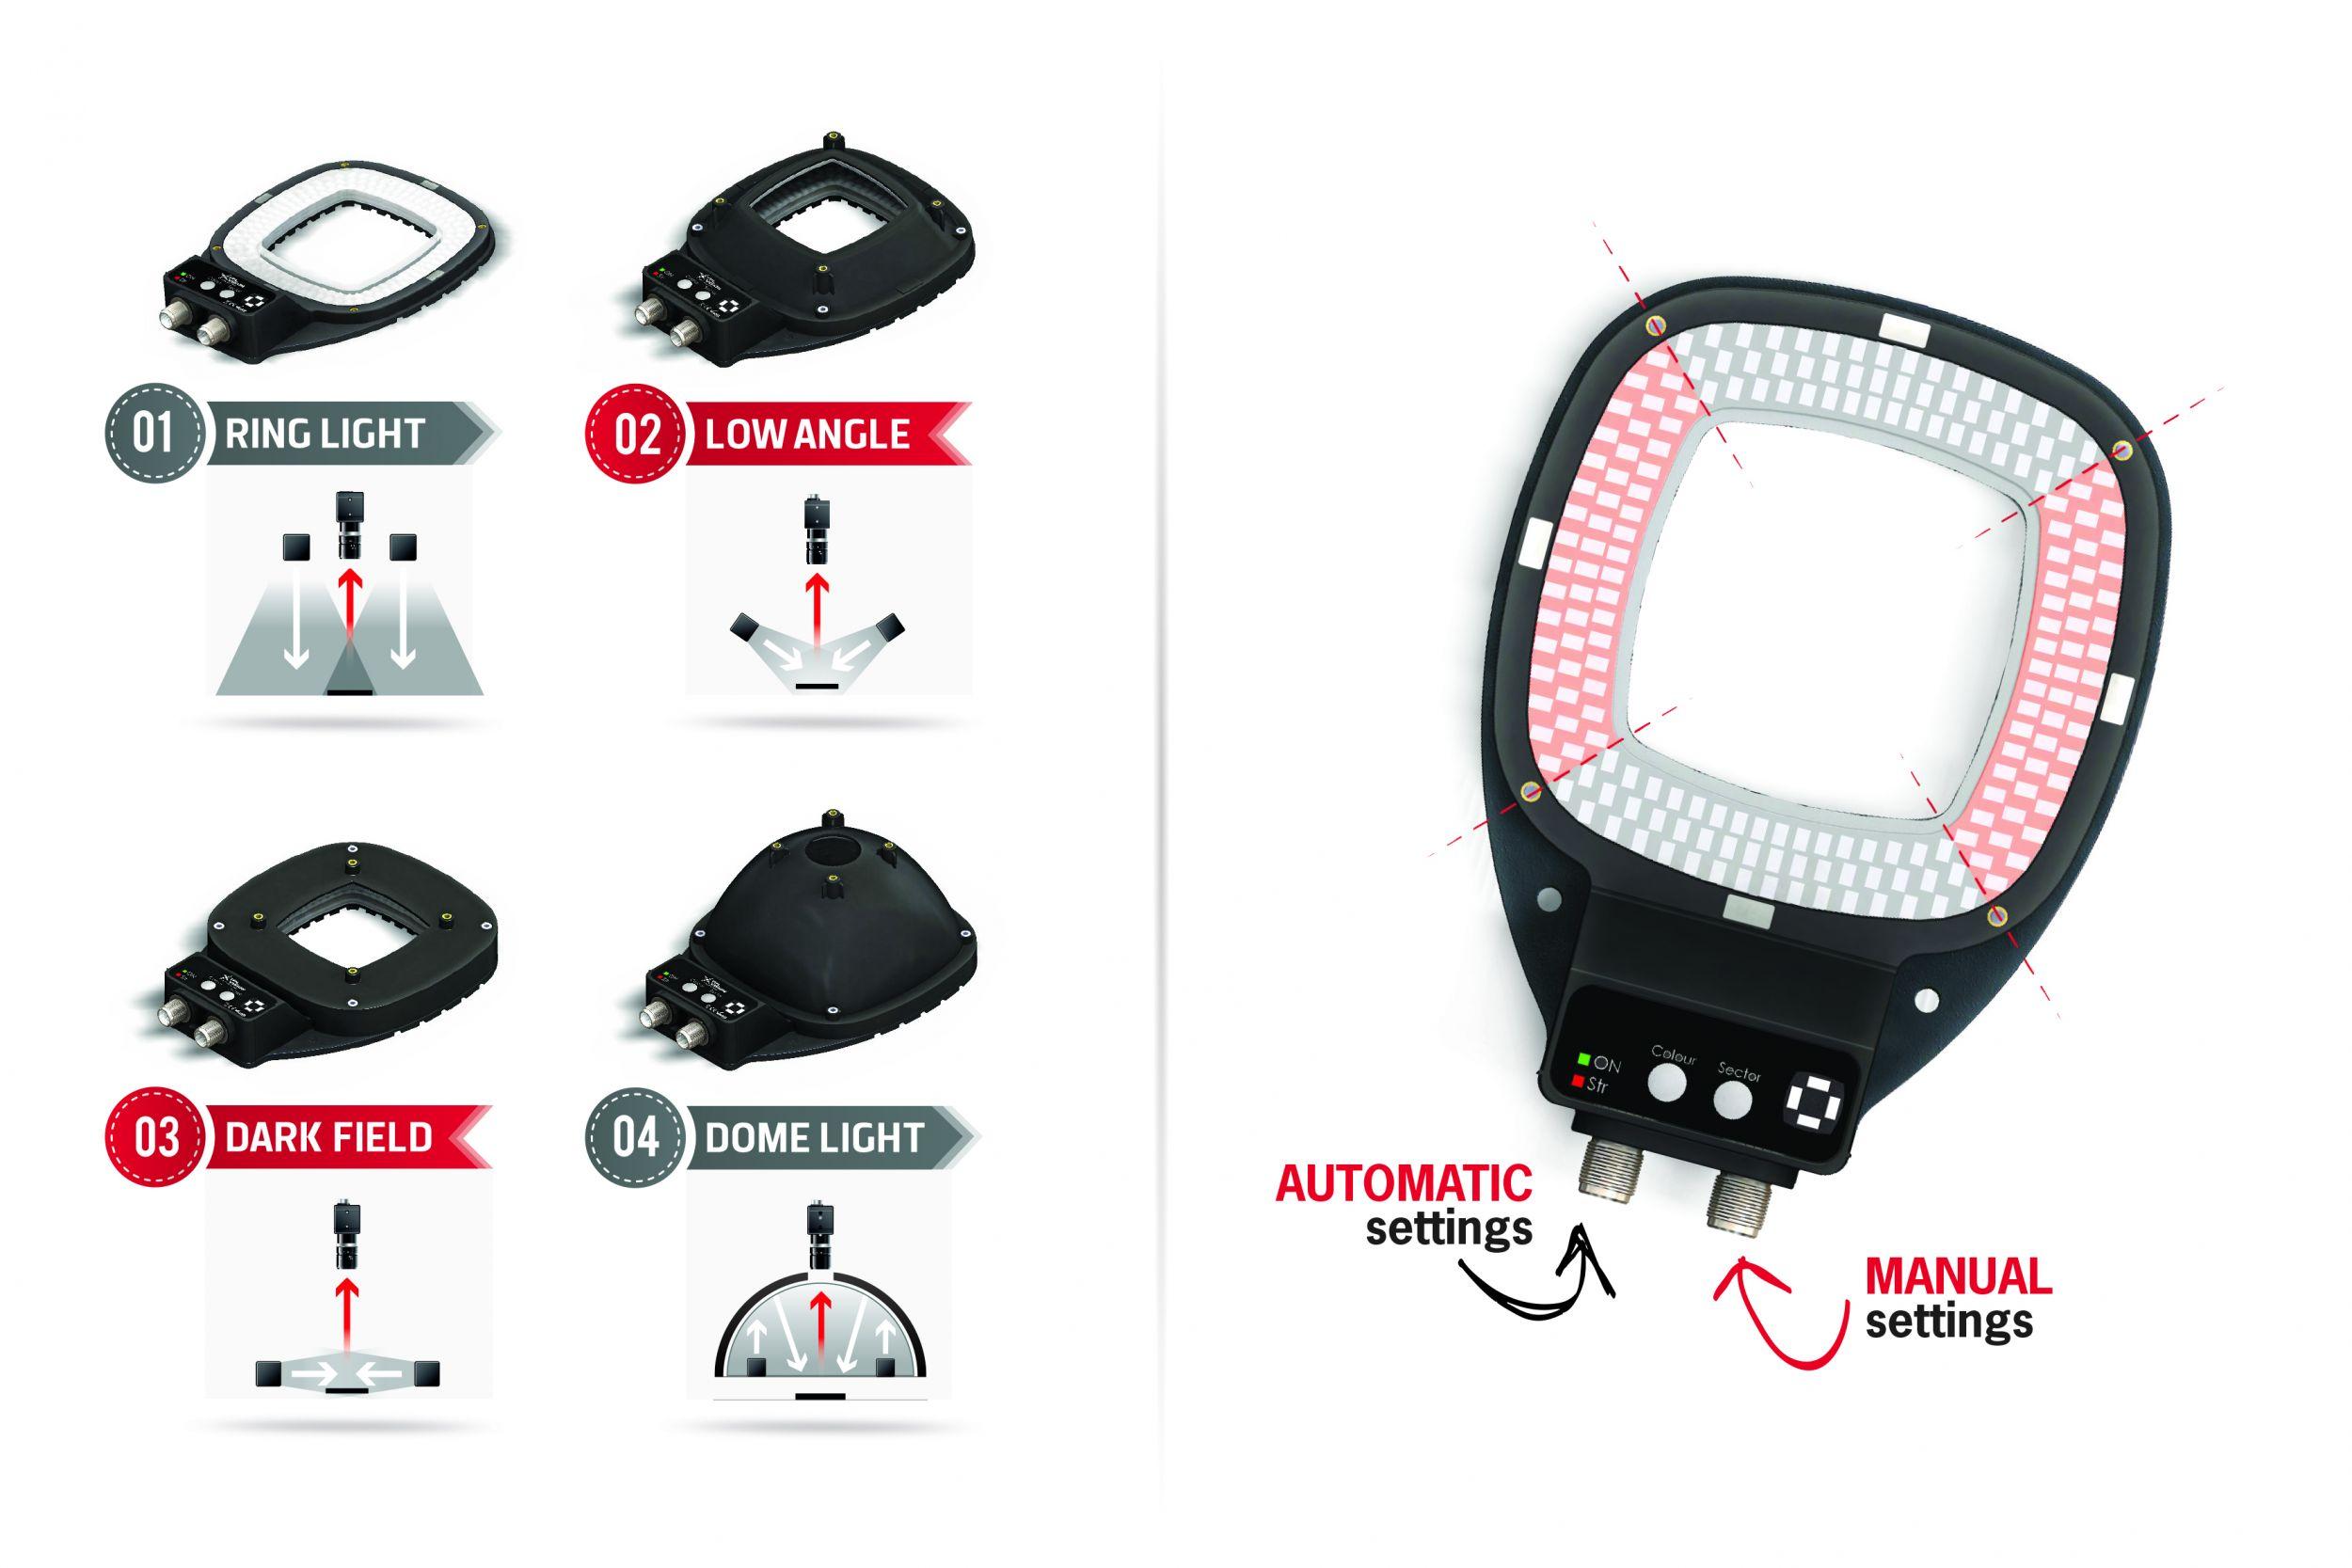 Modular Concept LED illumination